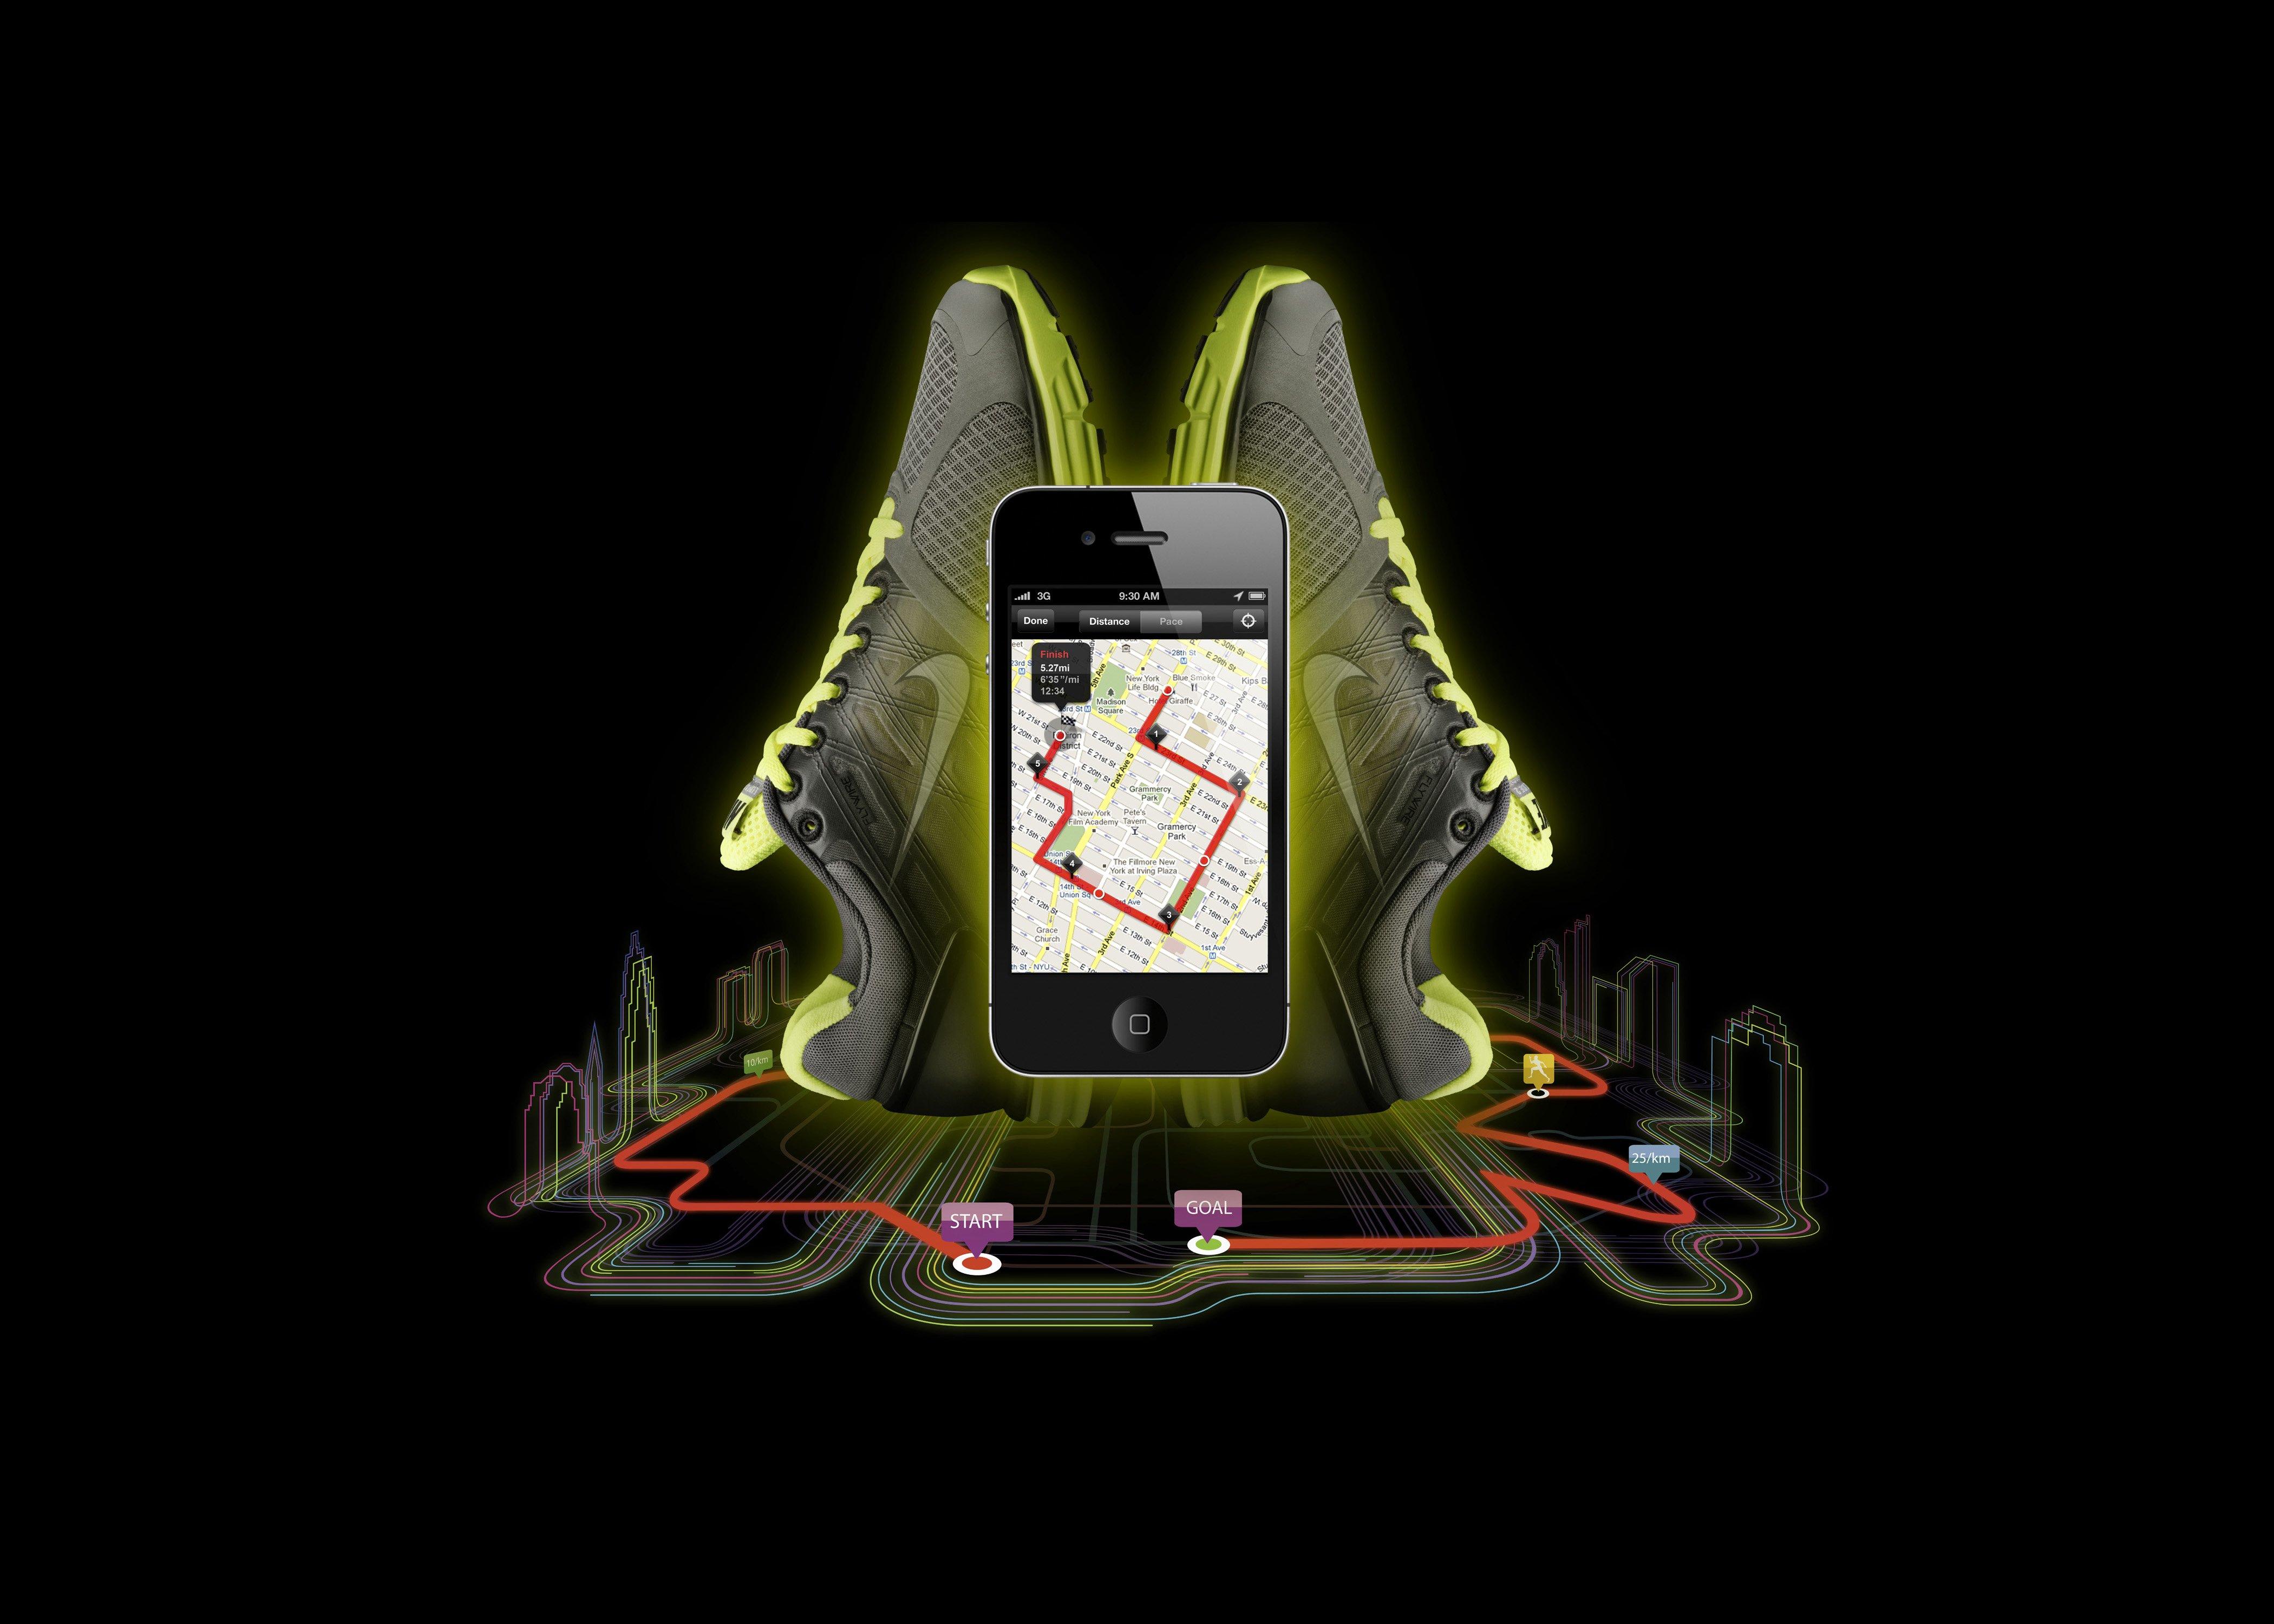 NIKE GPS 3